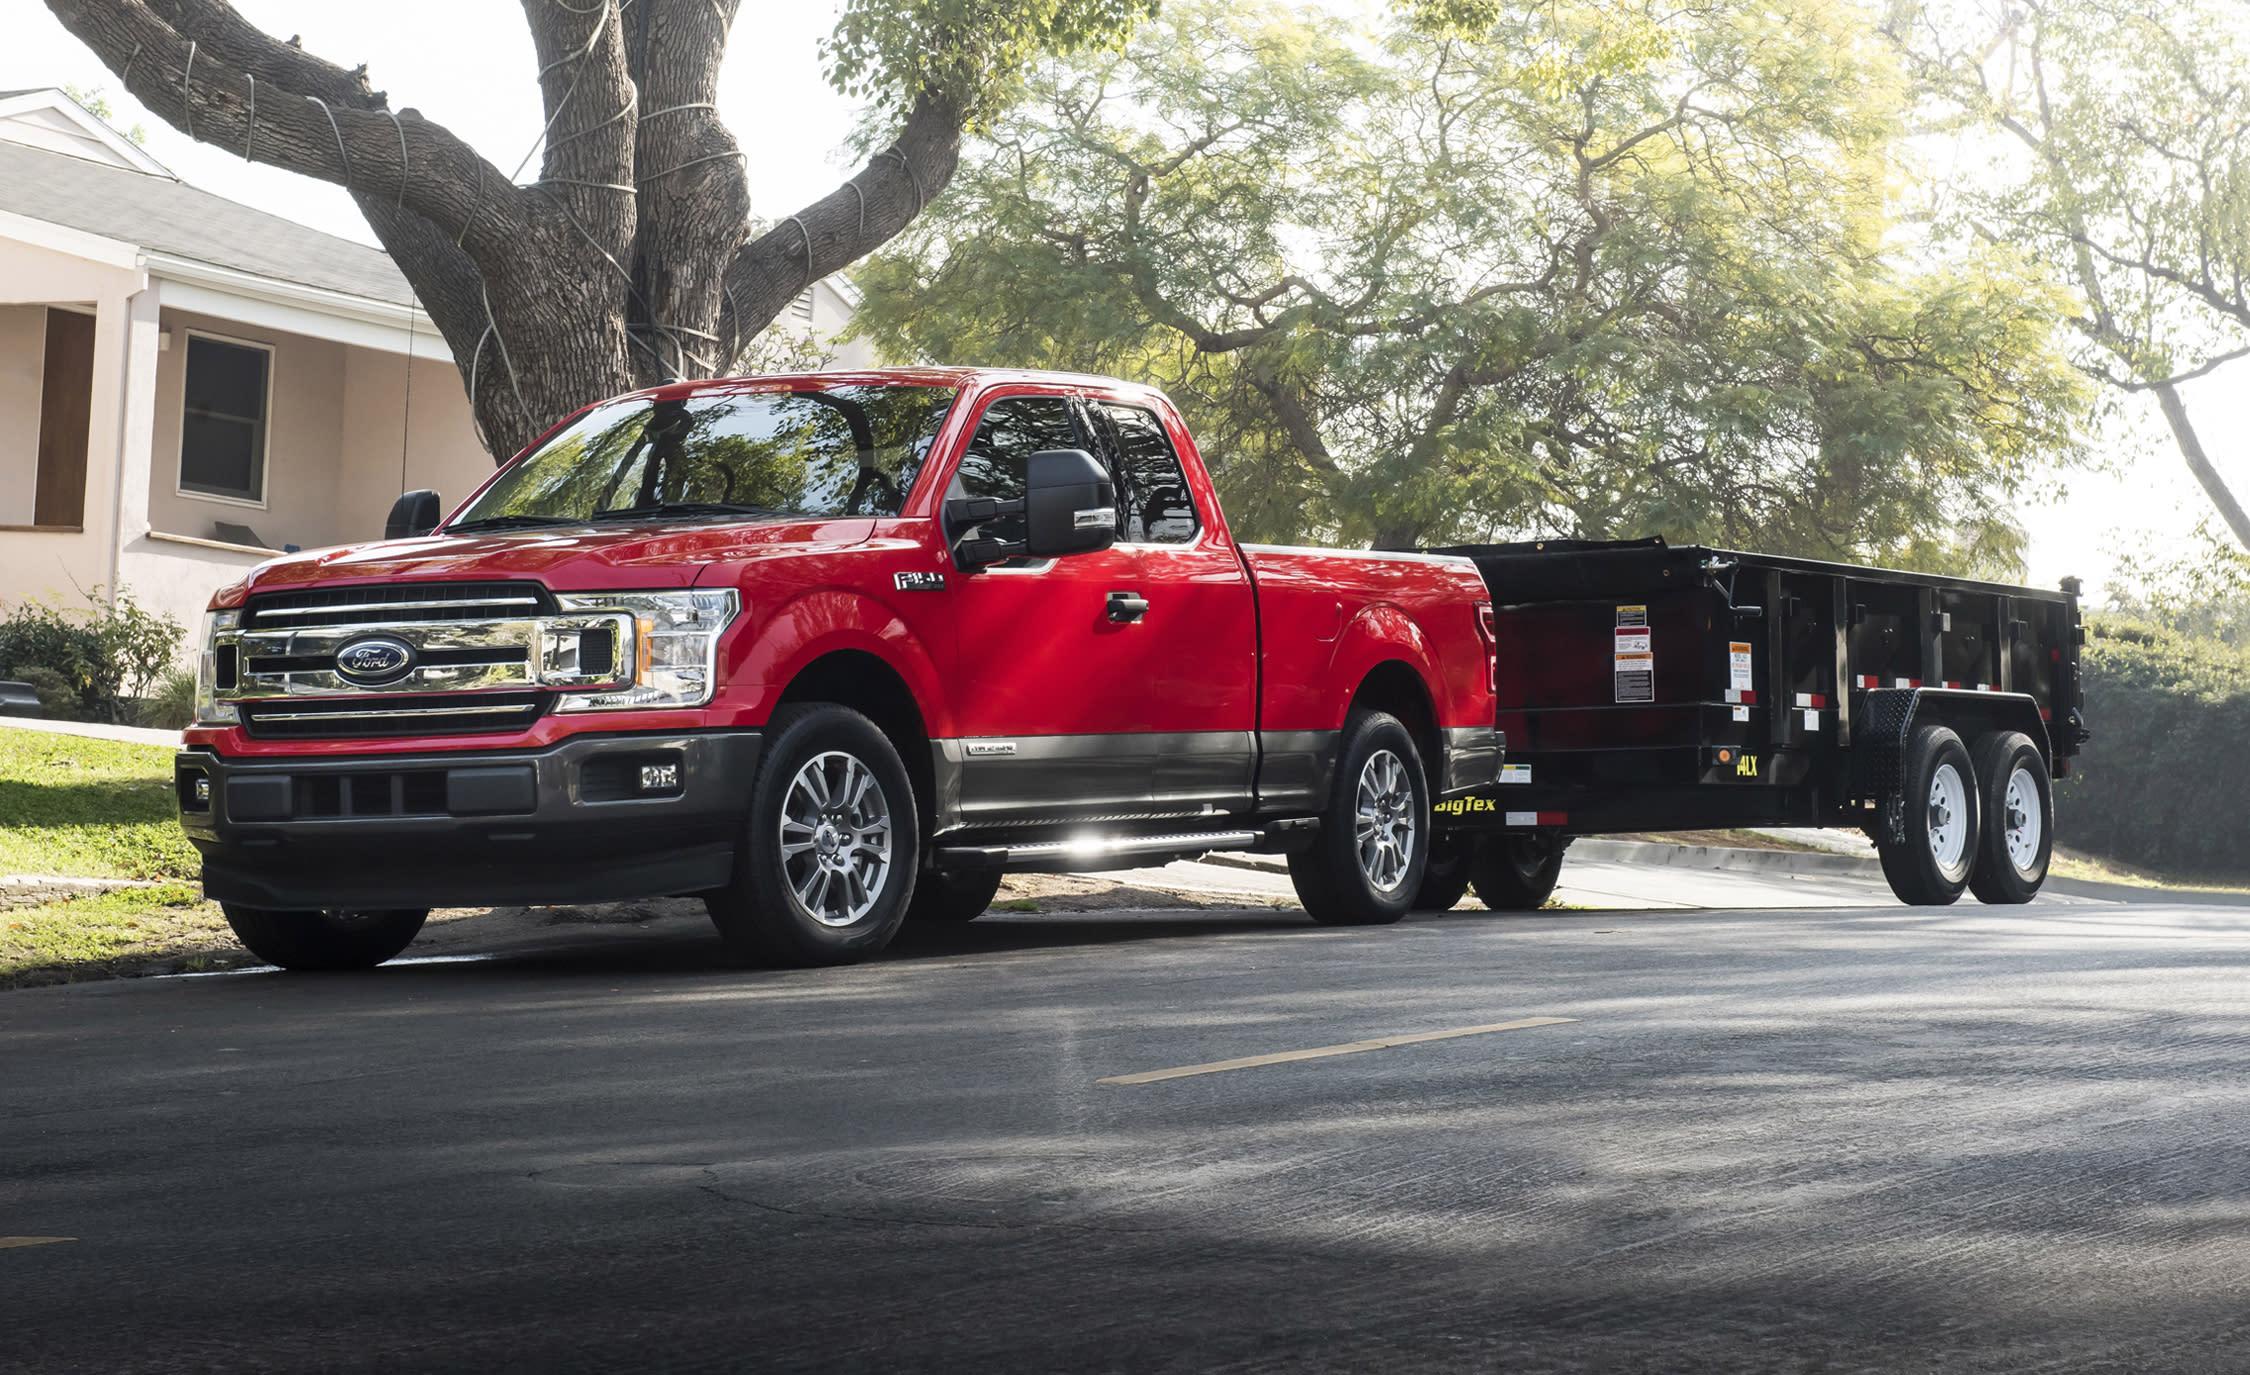 2018 ford f 150 diesel the best selling pickup gets a power stroke. Black Bedroom Furniture Sets. Home Design Ideas